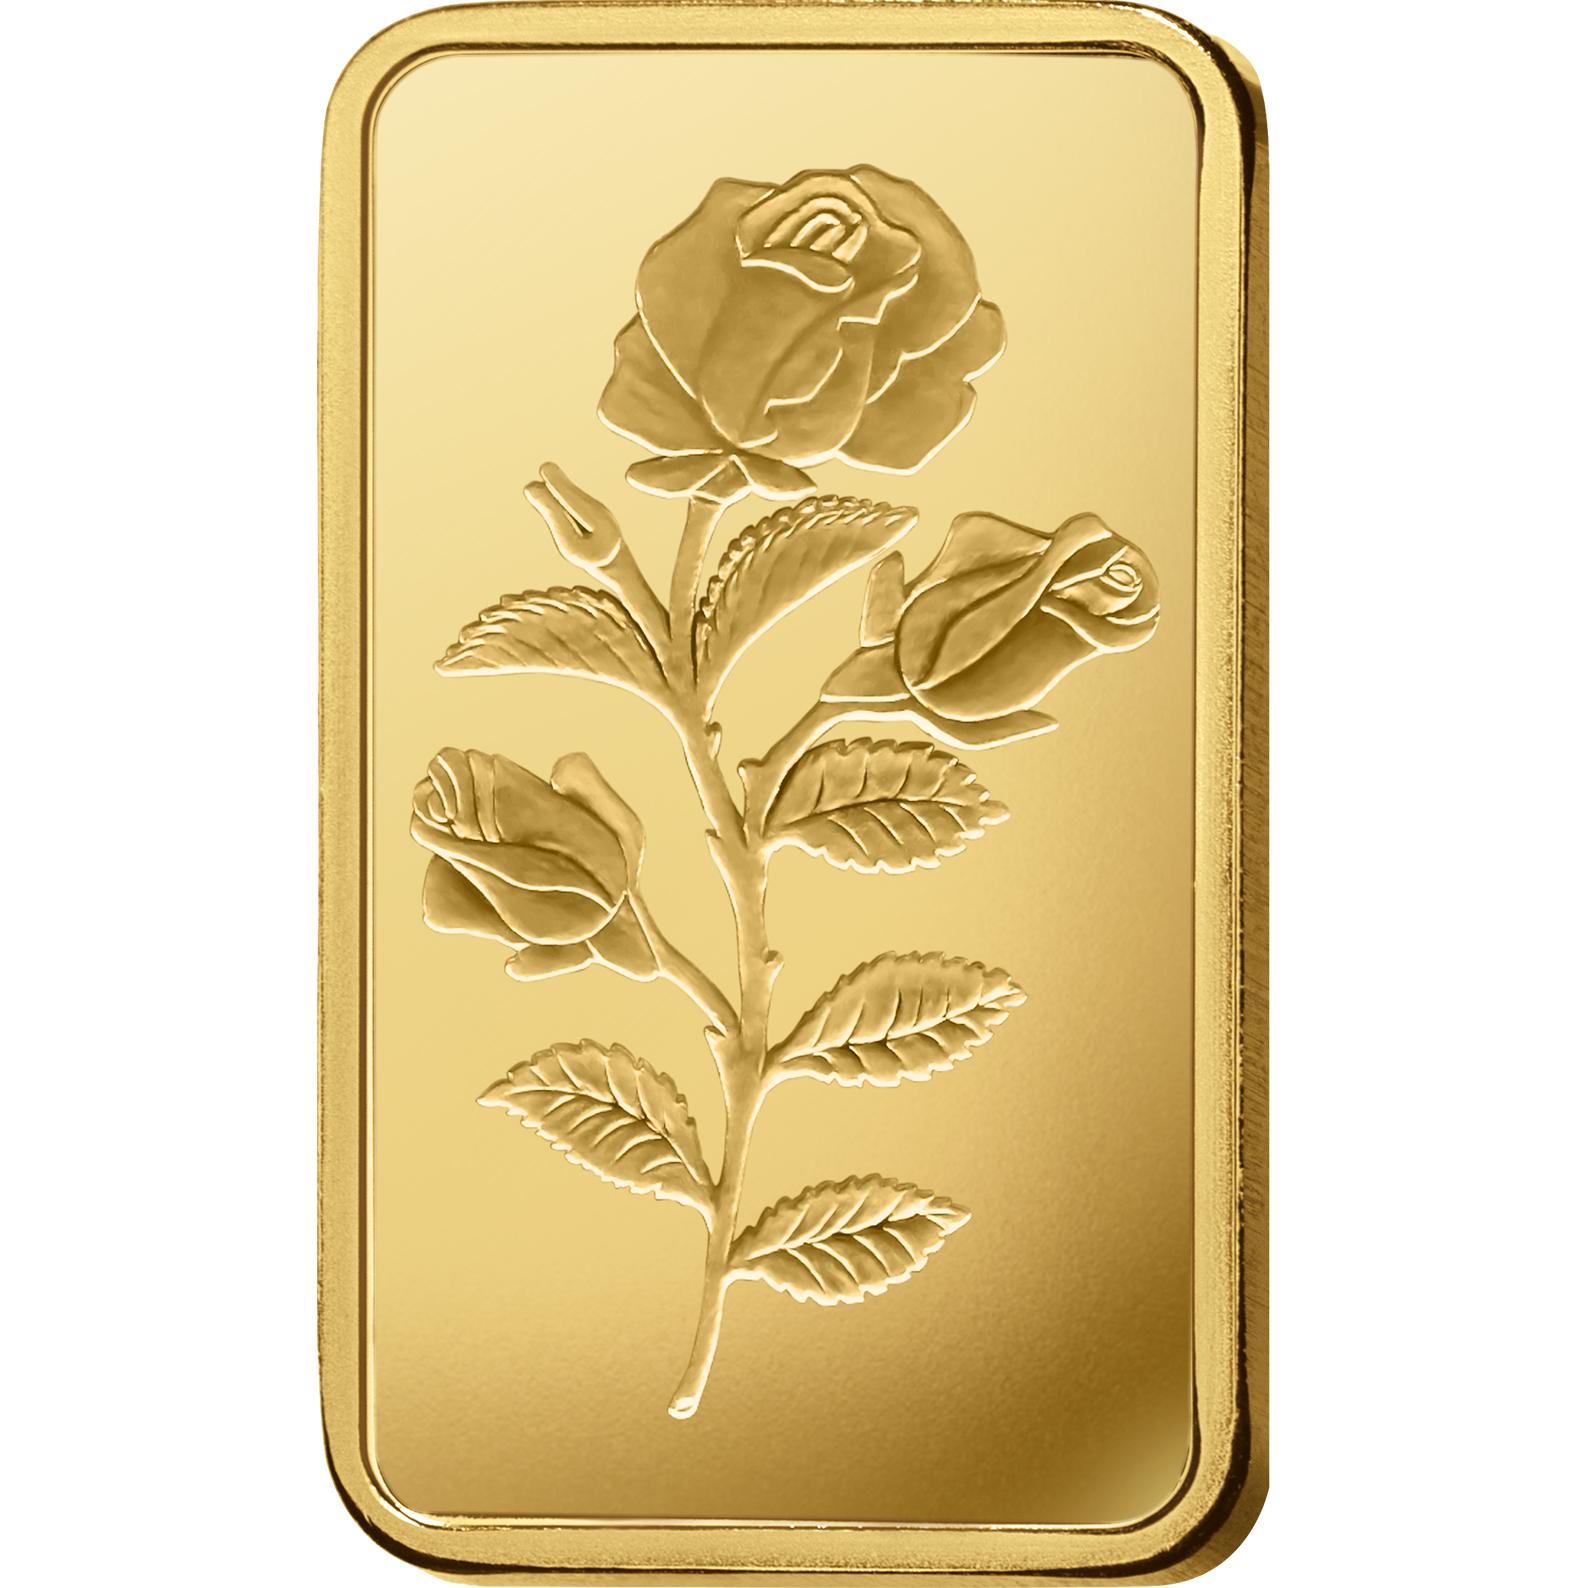 1/2 oncia lingottino d'oro puro 999.9 - PAMP Suisse Rosa